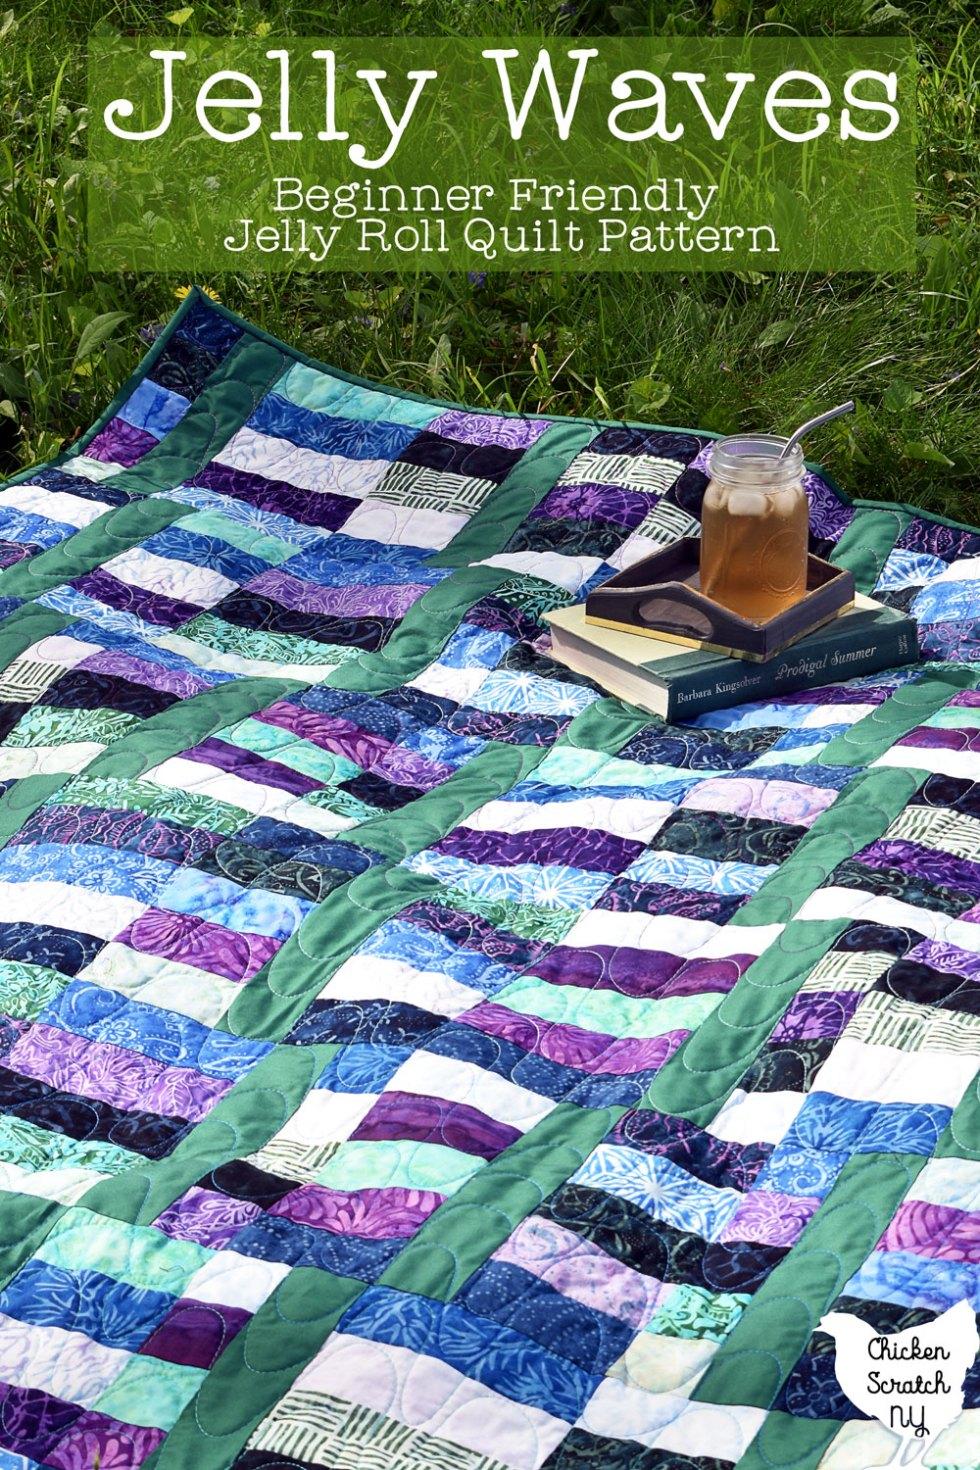 jelly waves quilt pattern sewn in batik prints